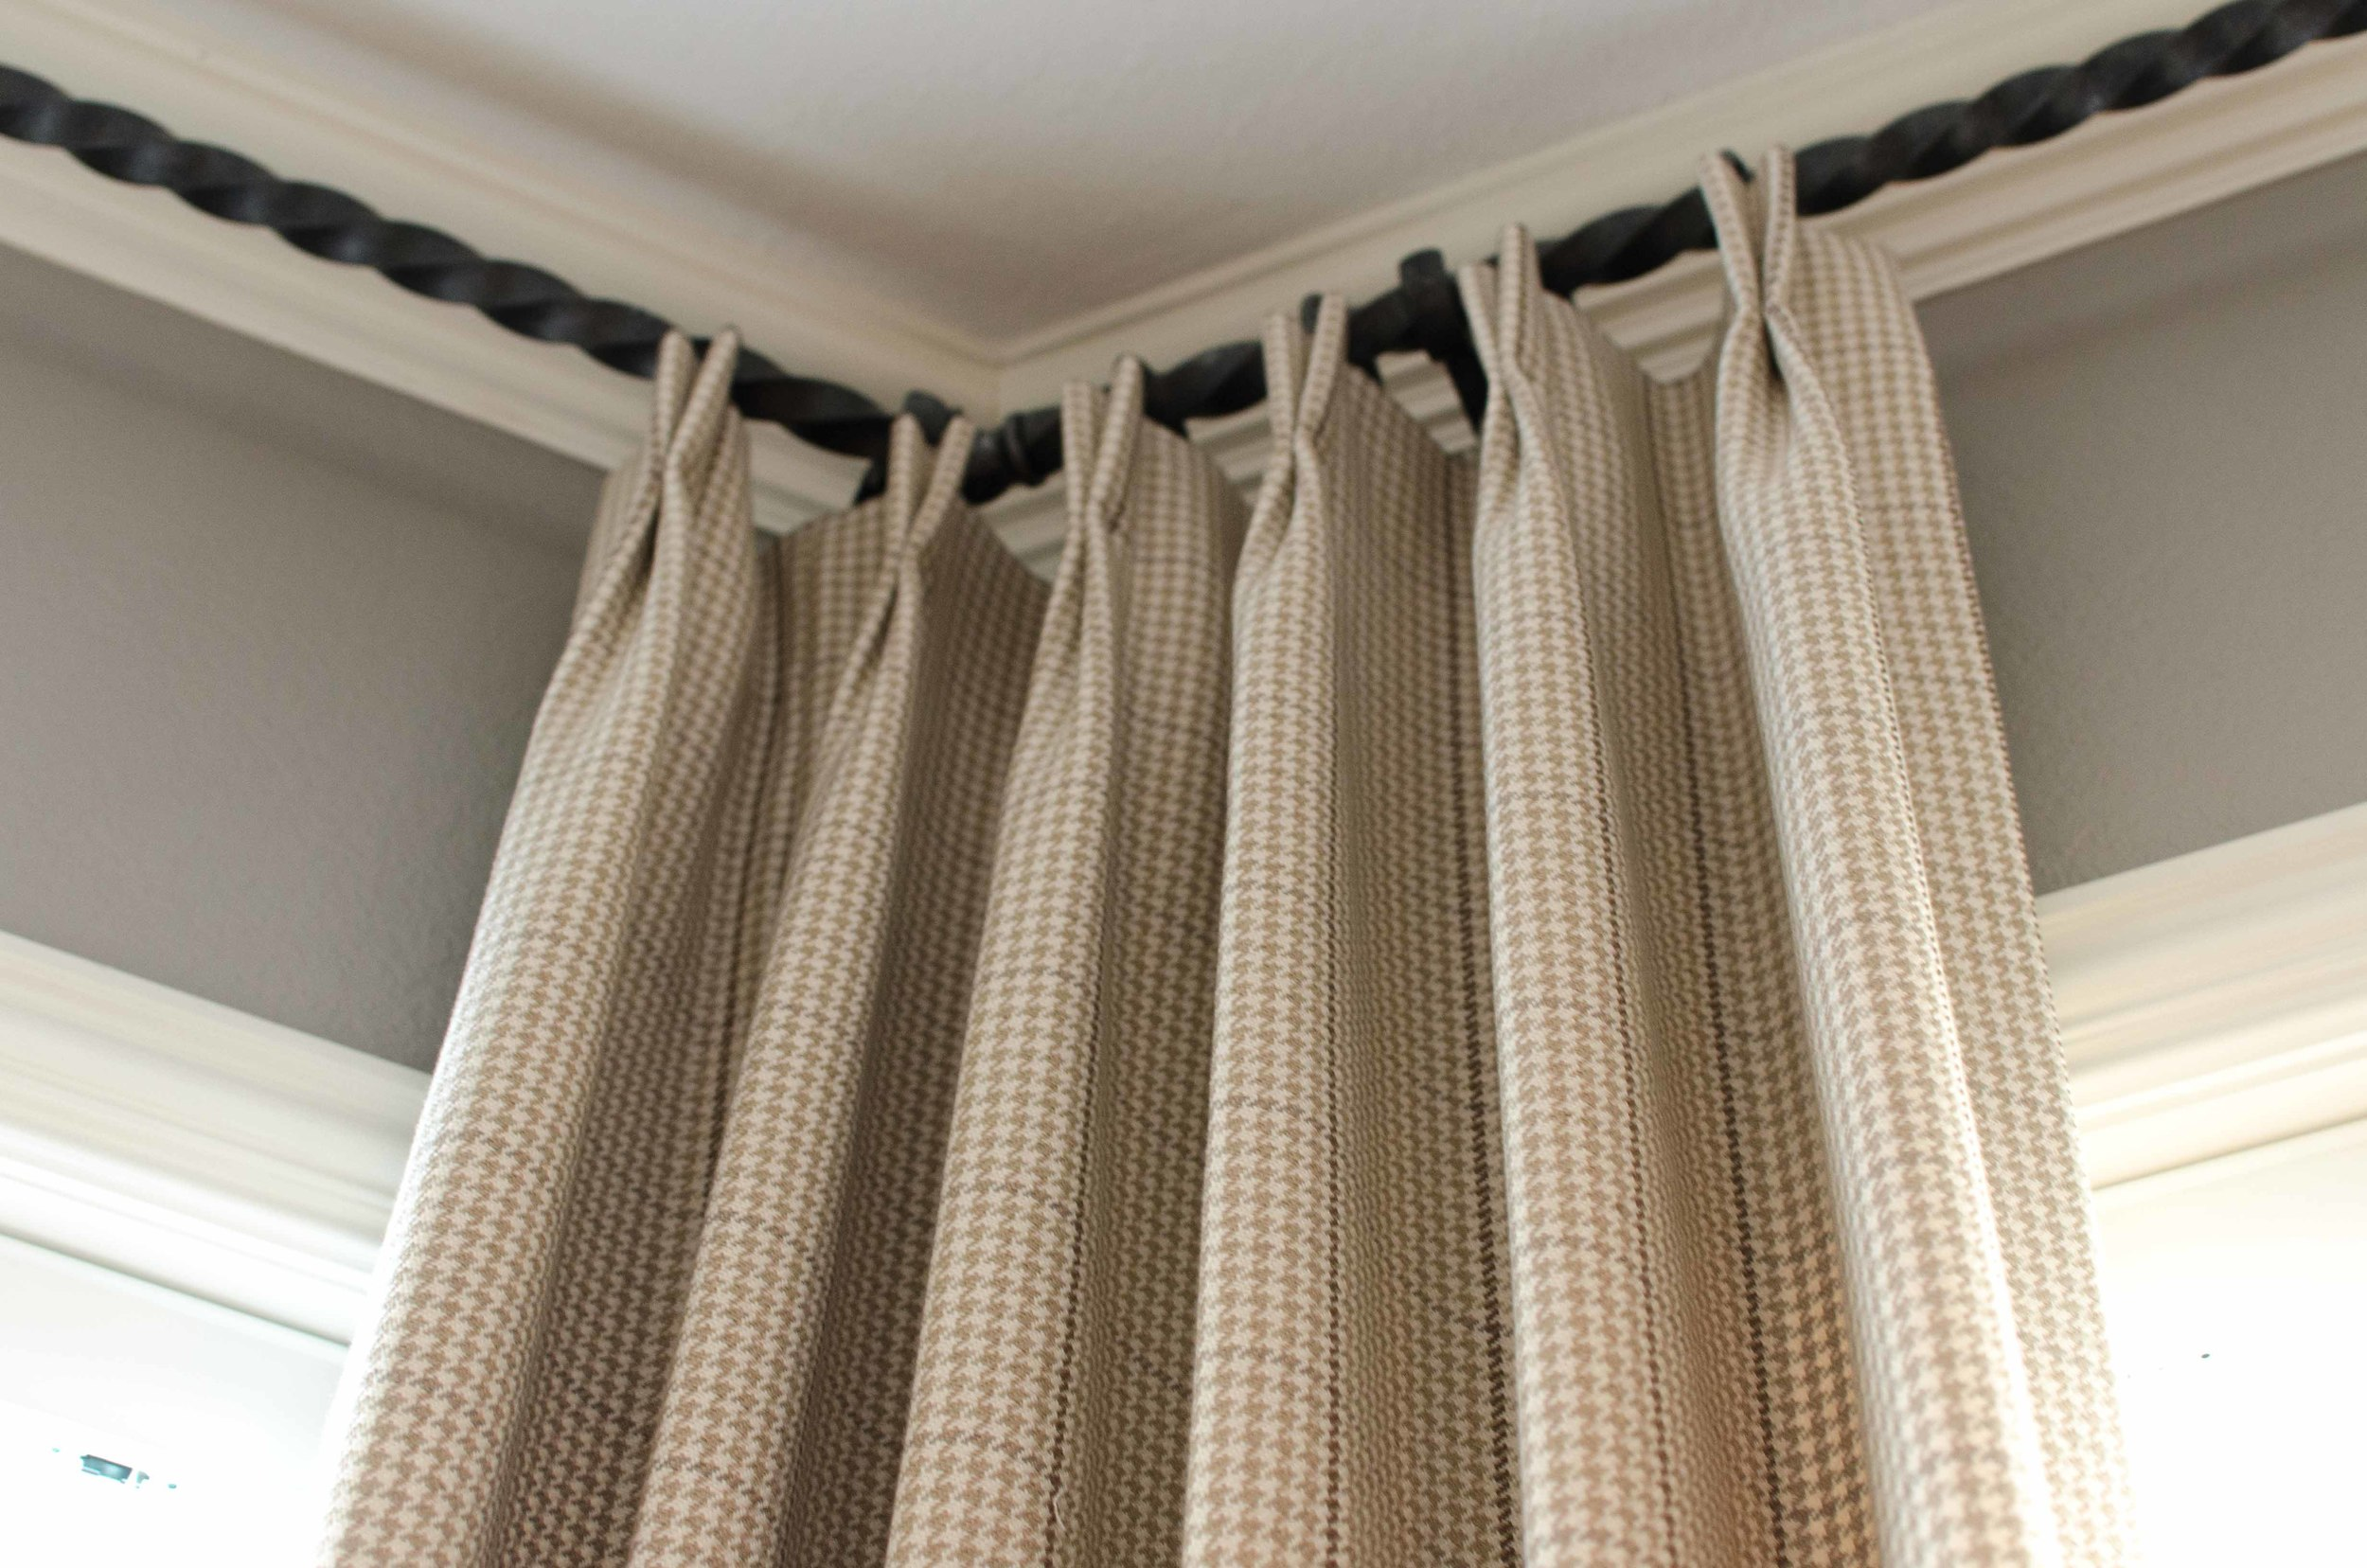 Twisted metal curtain rod